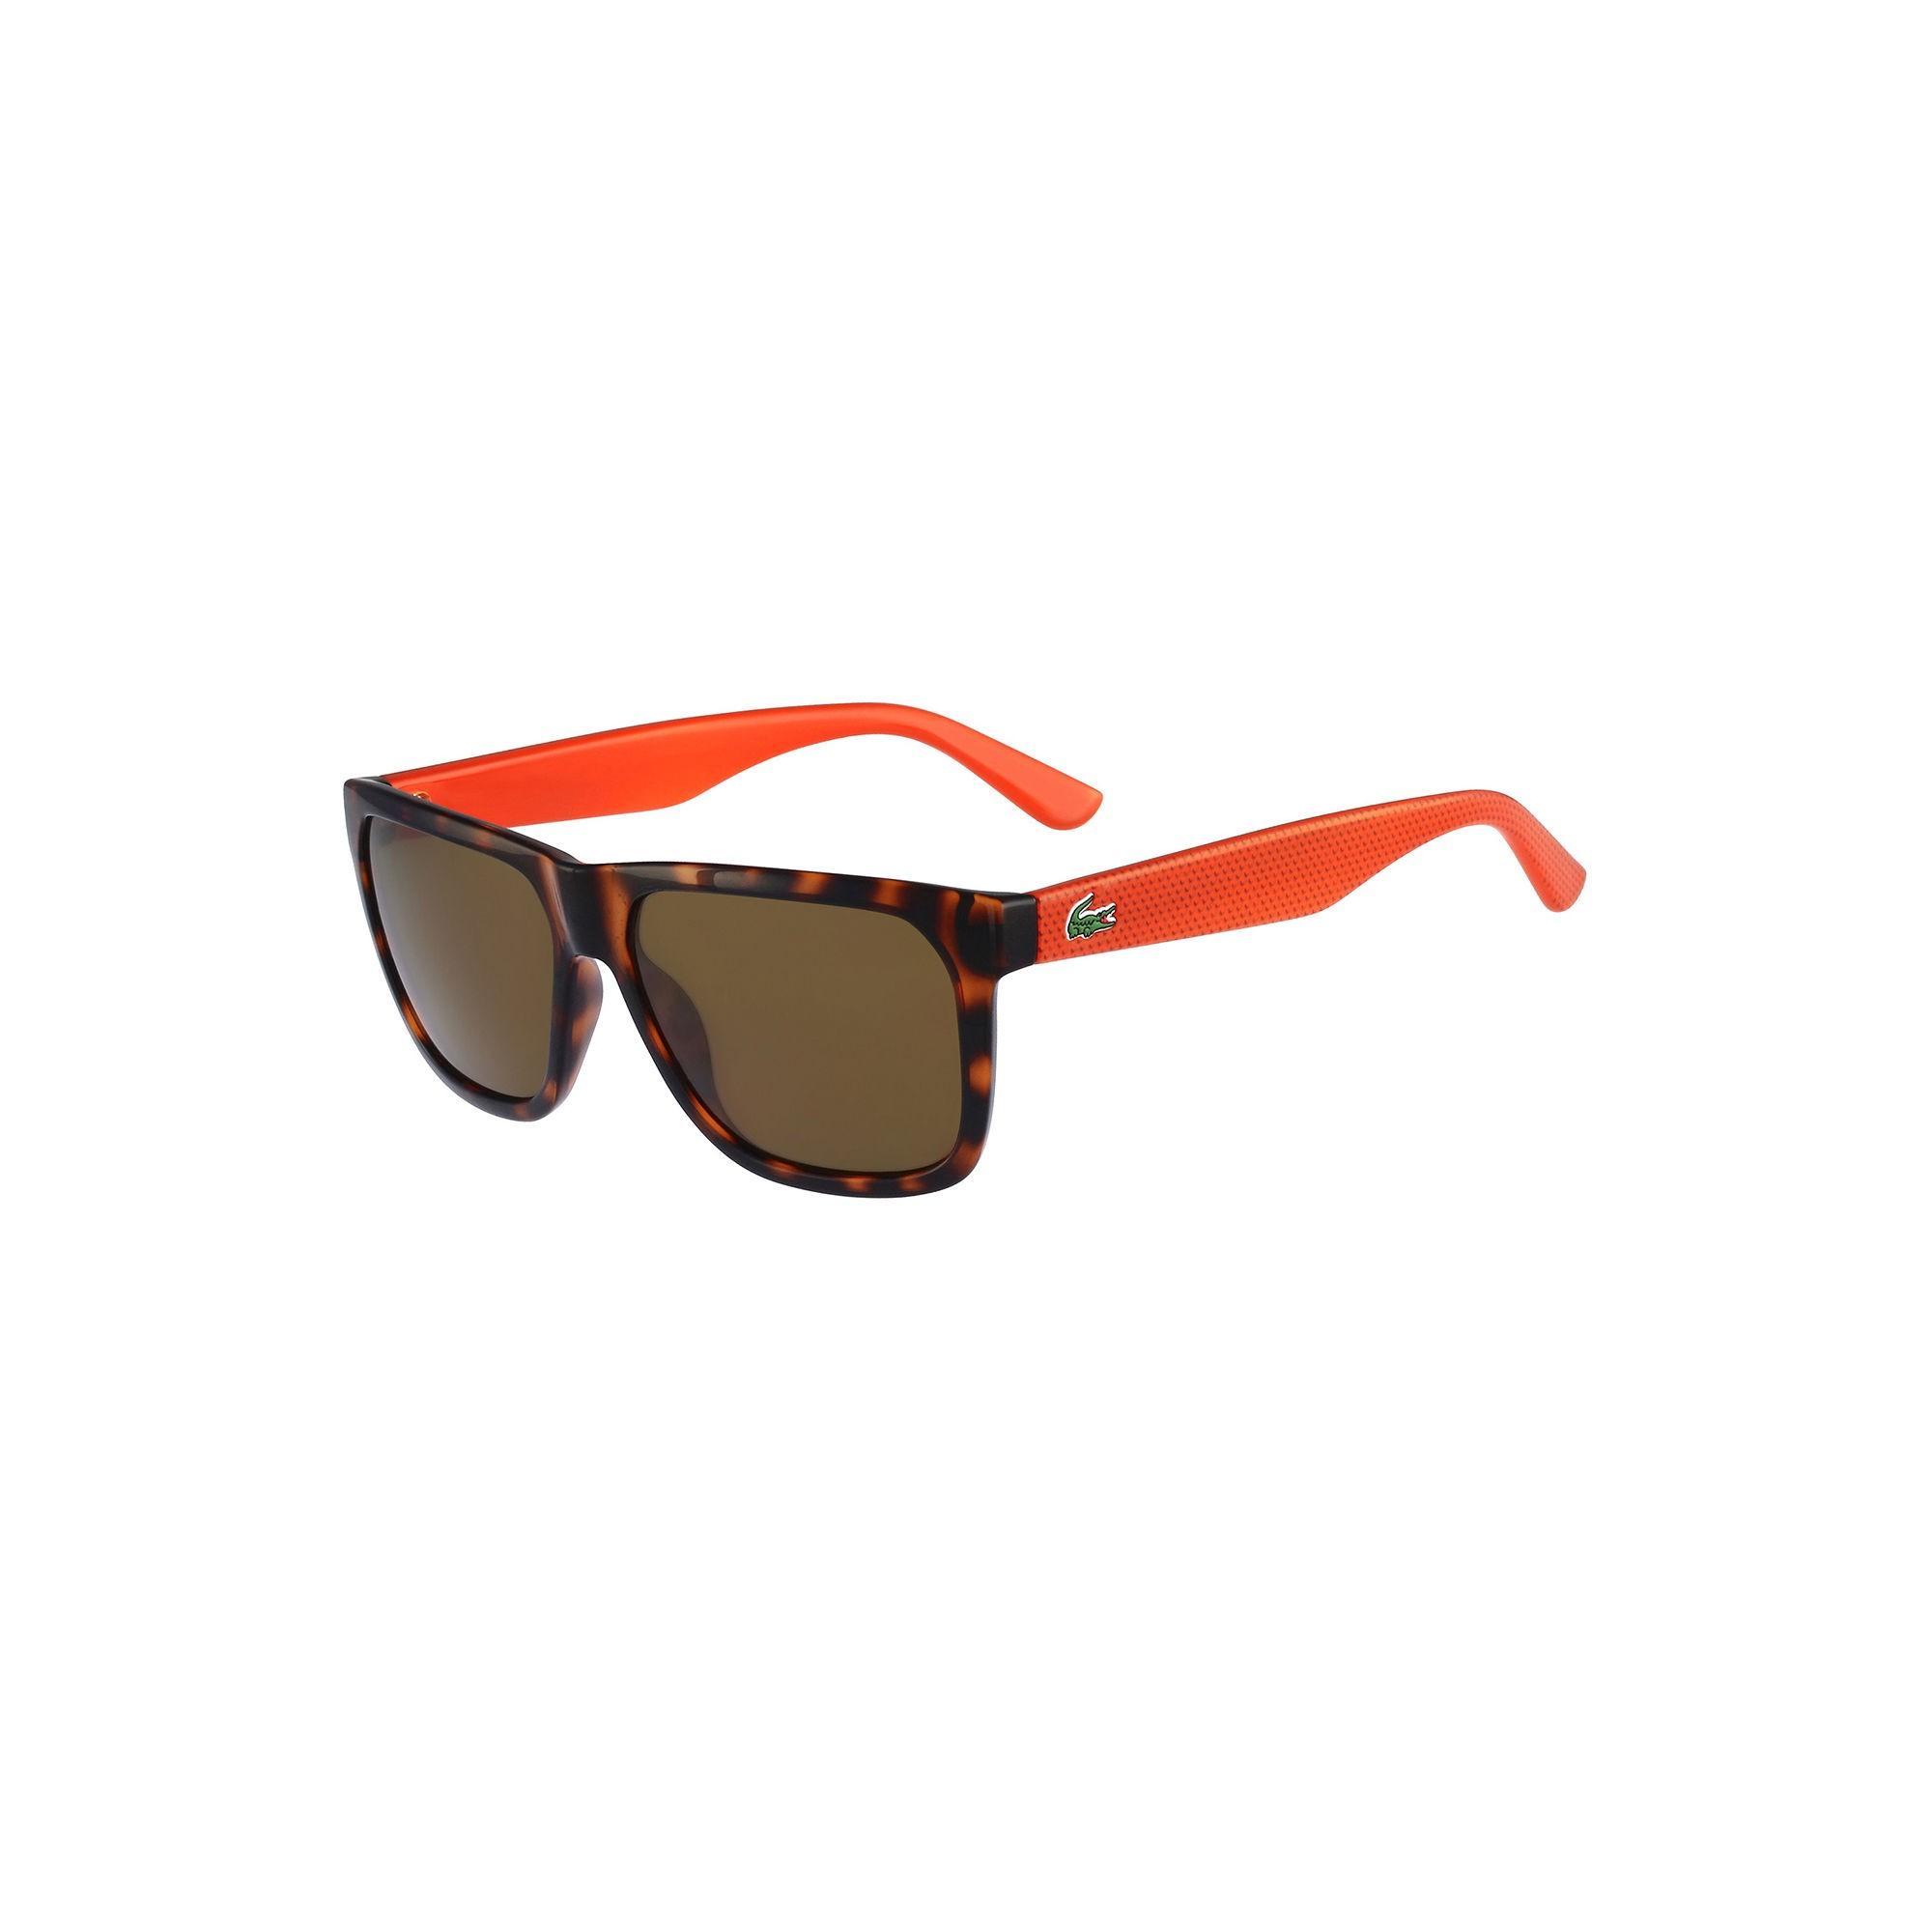 Lacoste Men's Classic Wayfarer Sunglasses - 214